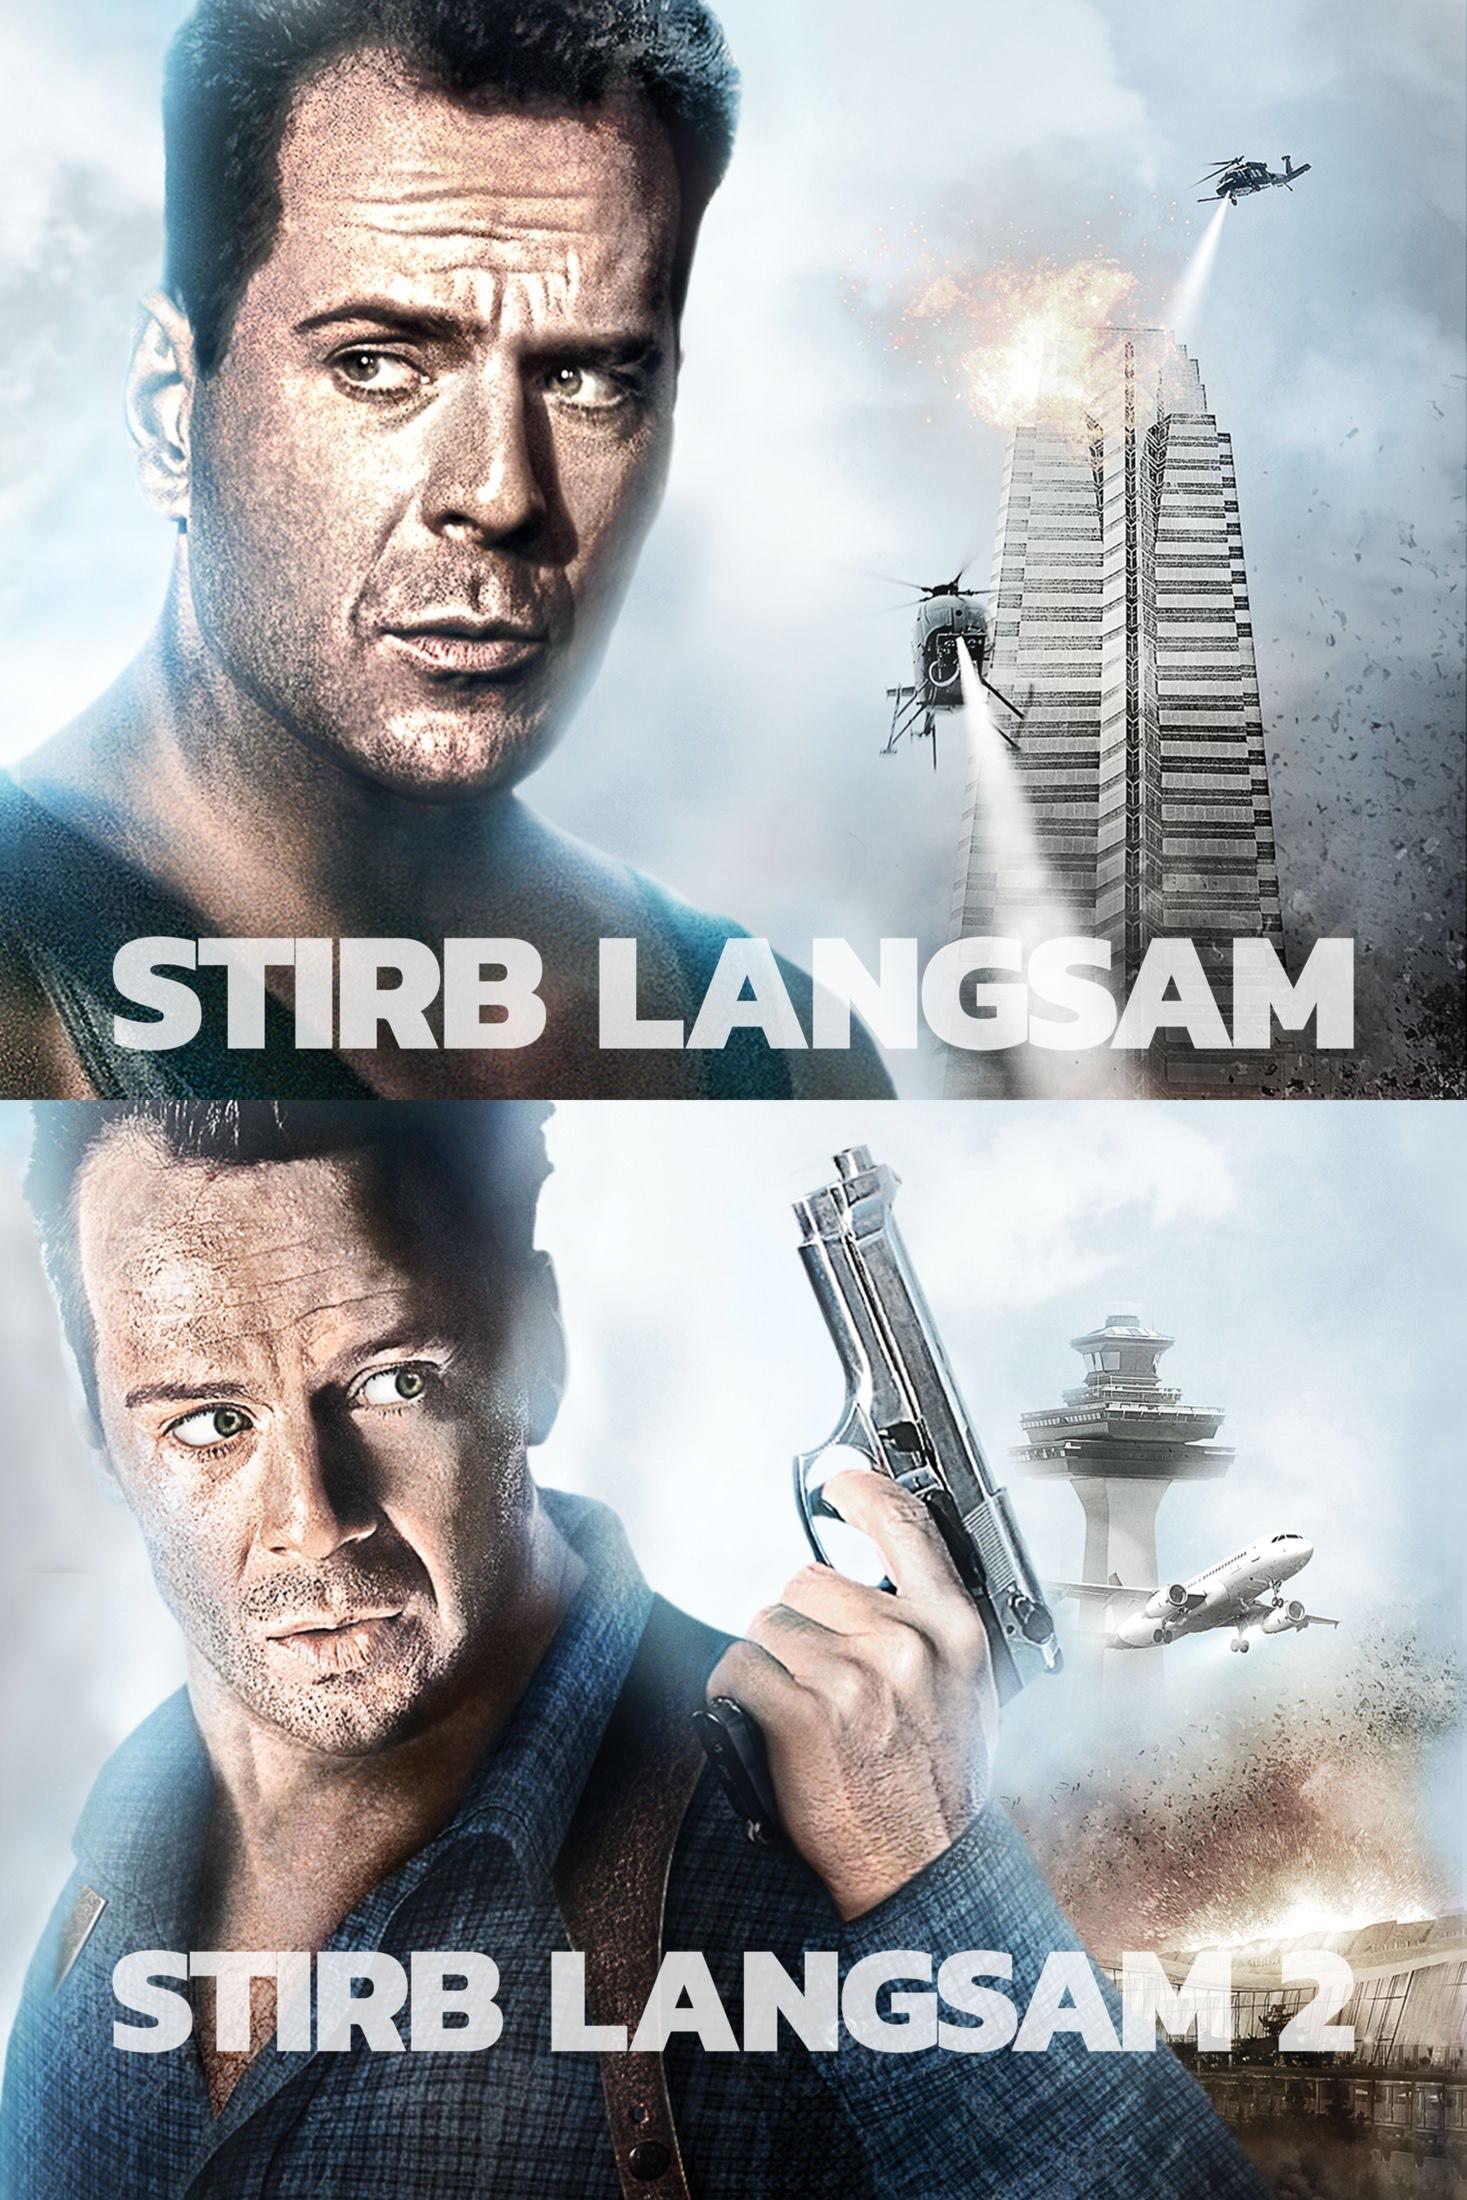 [iTunes] Stirb Langsam 1 & 2 - 4K, HDR, Extras